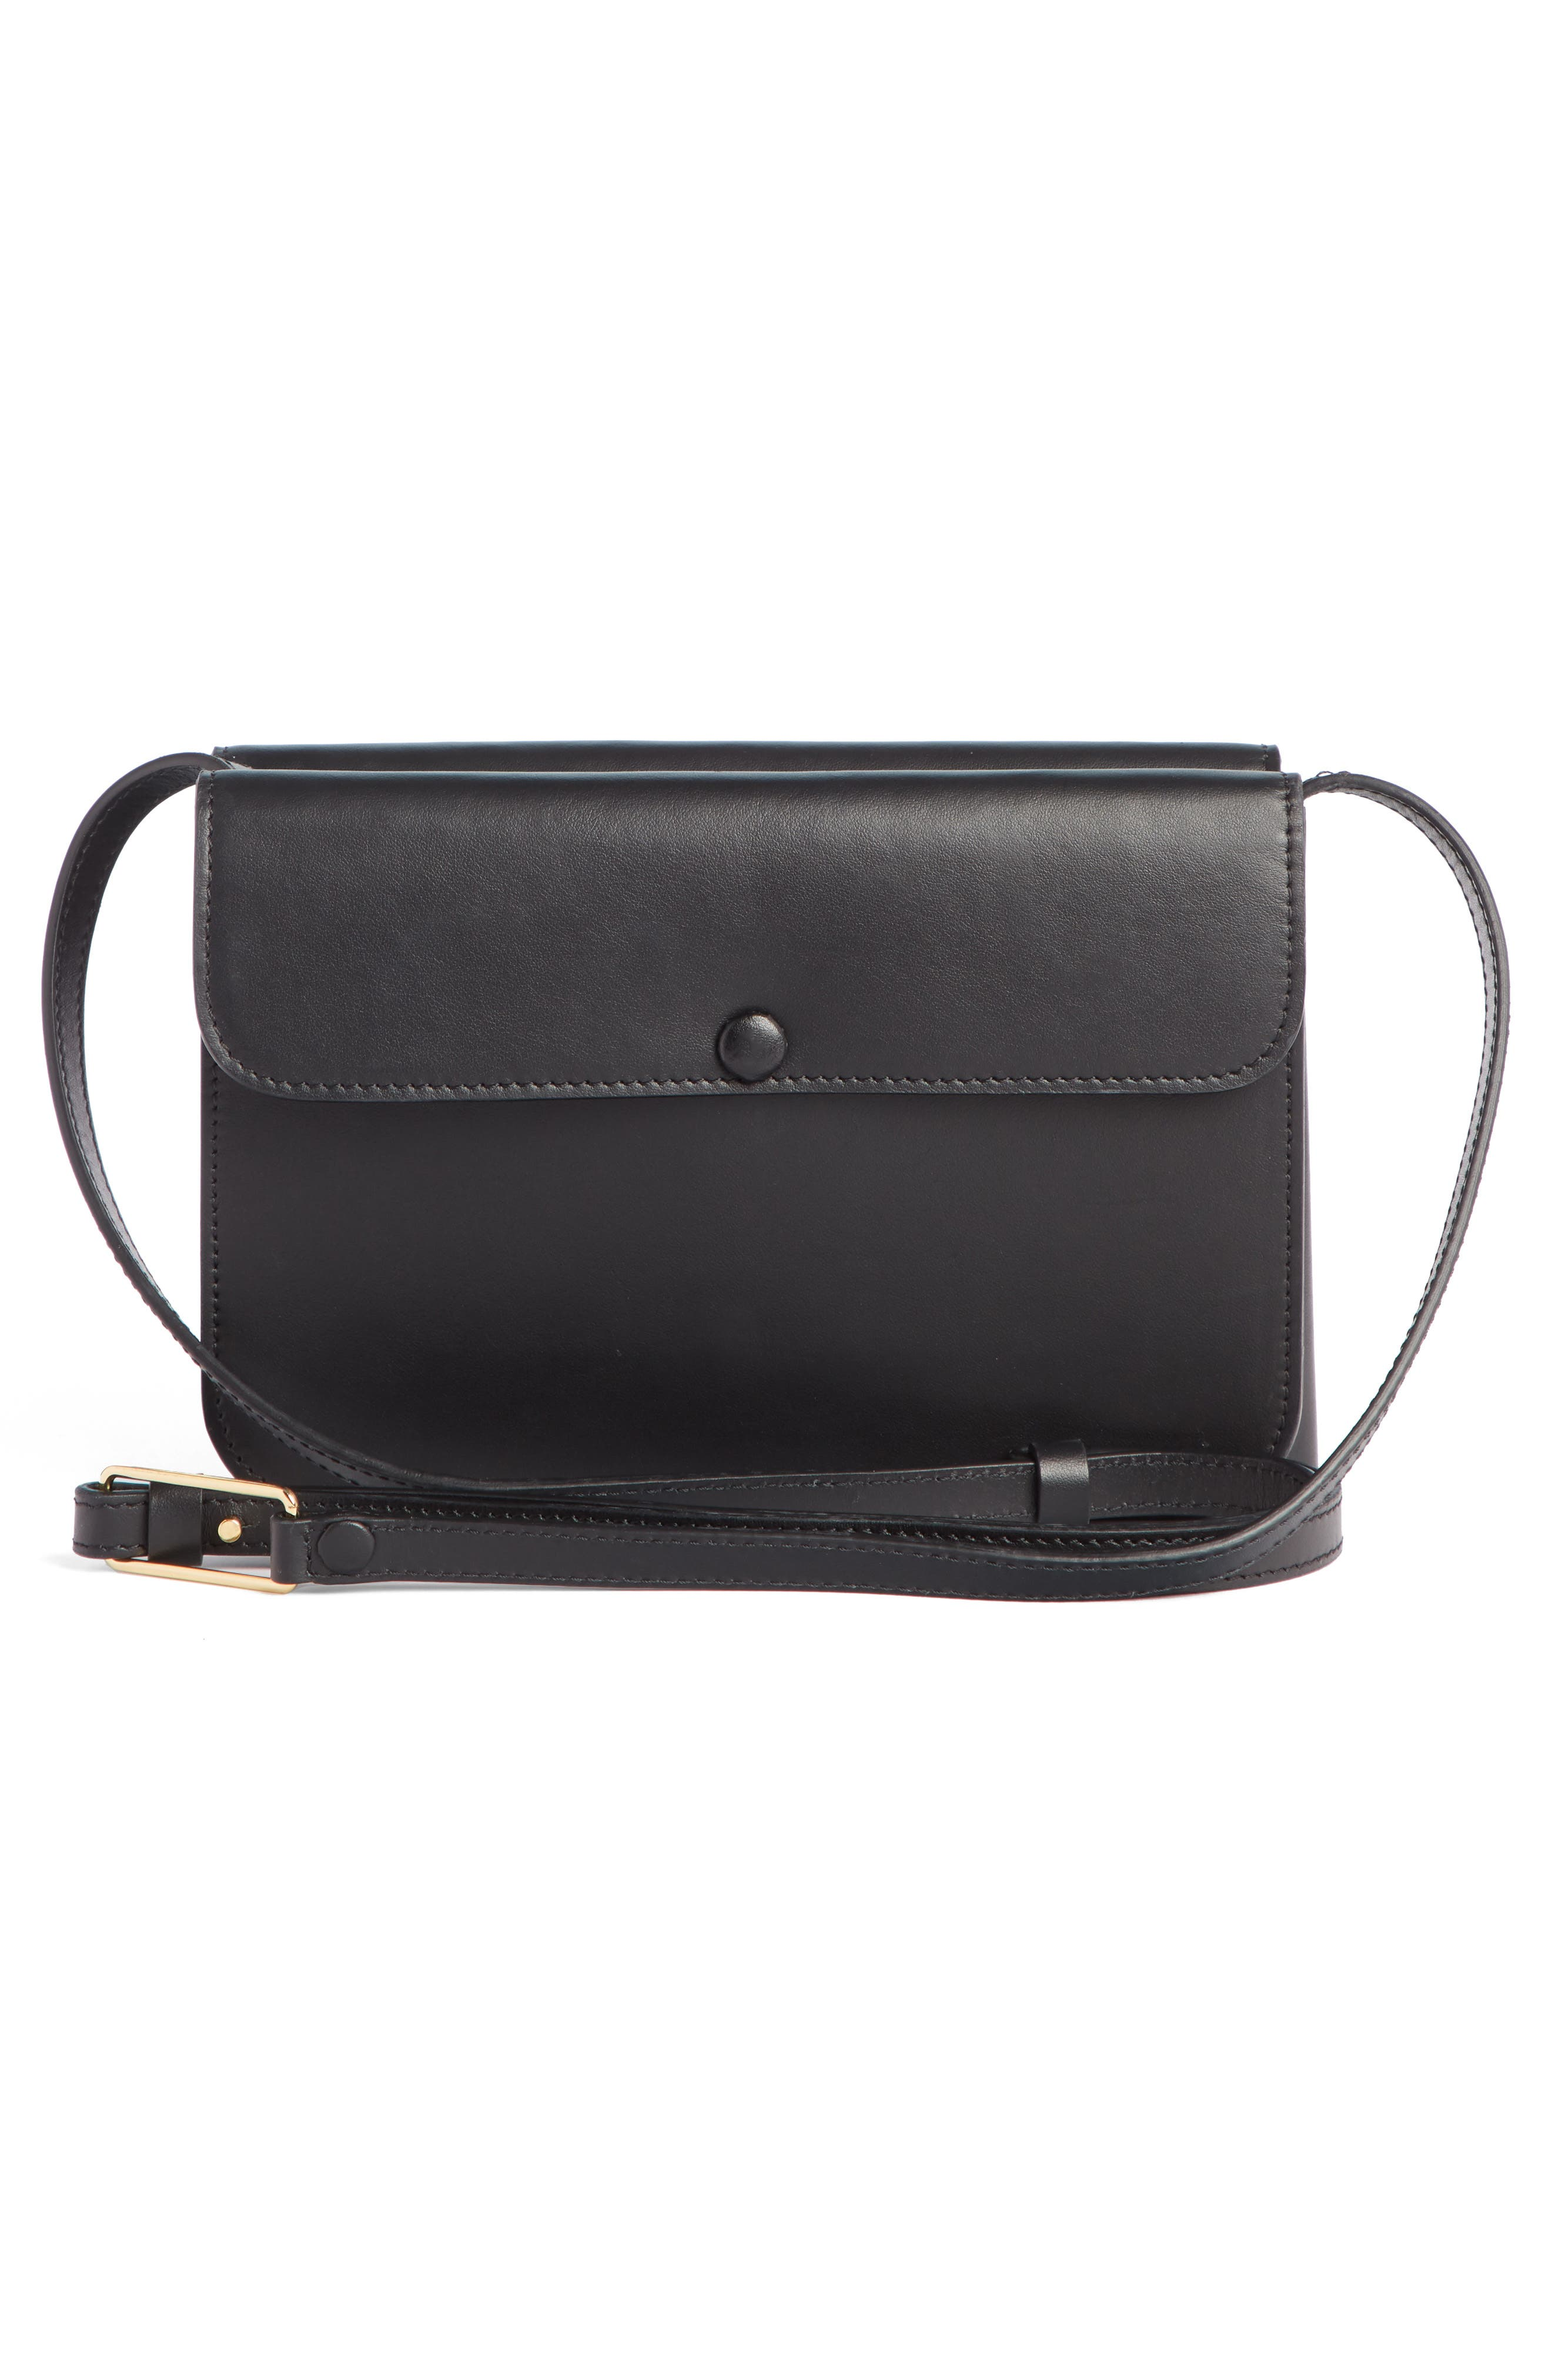 VICTORIA BECKHAM, Twin Leather Crossbody Bag, Alternate thumbnail 3, color, BLACK